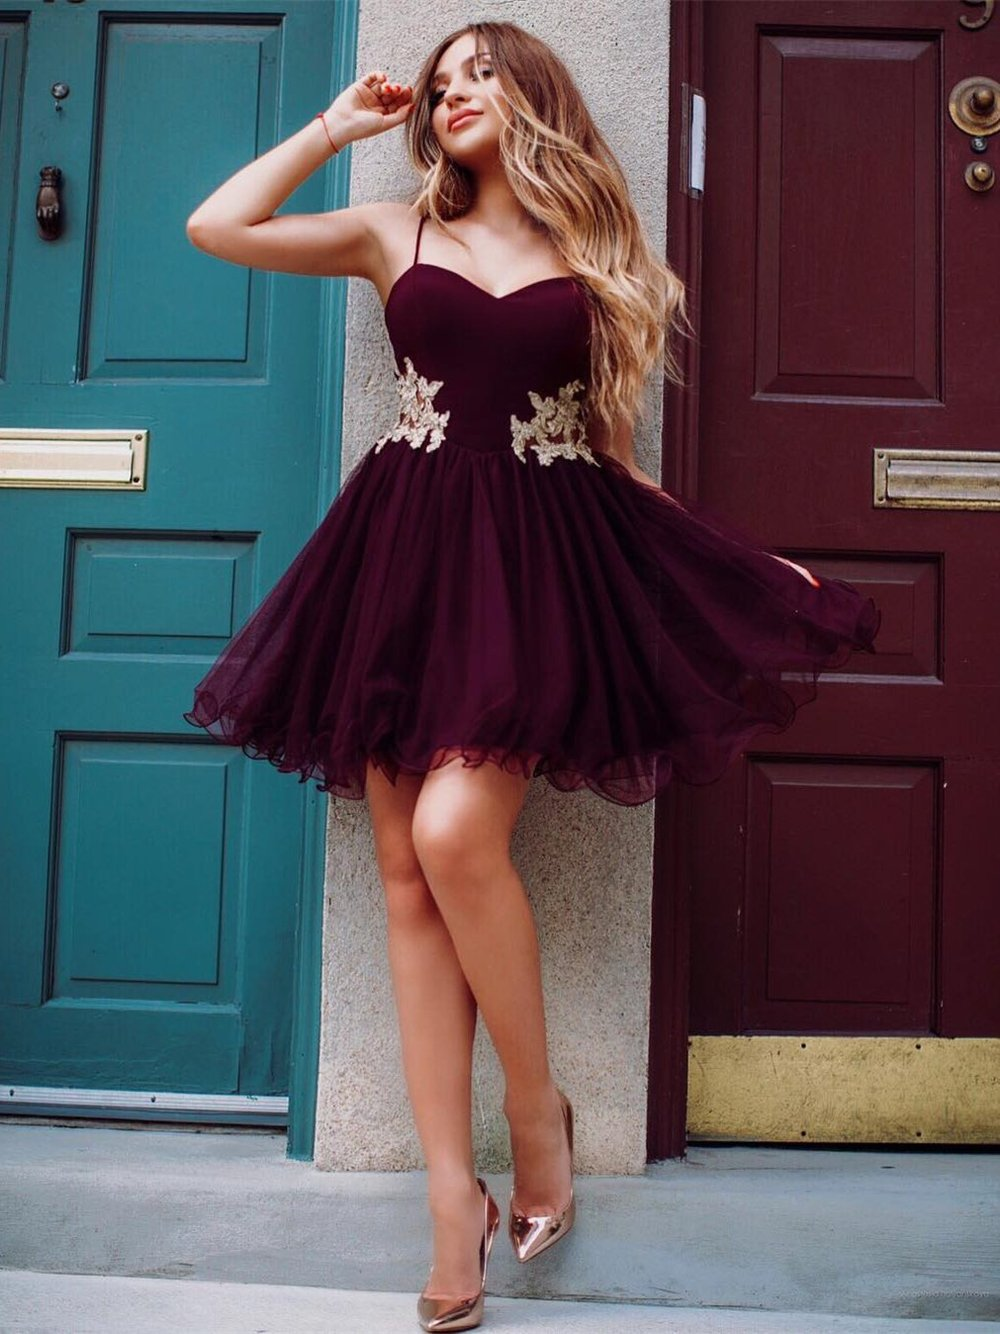 df60a403a0 Halter Burgundy Gold Lace Applique Short Homecoming Dresses Online ...